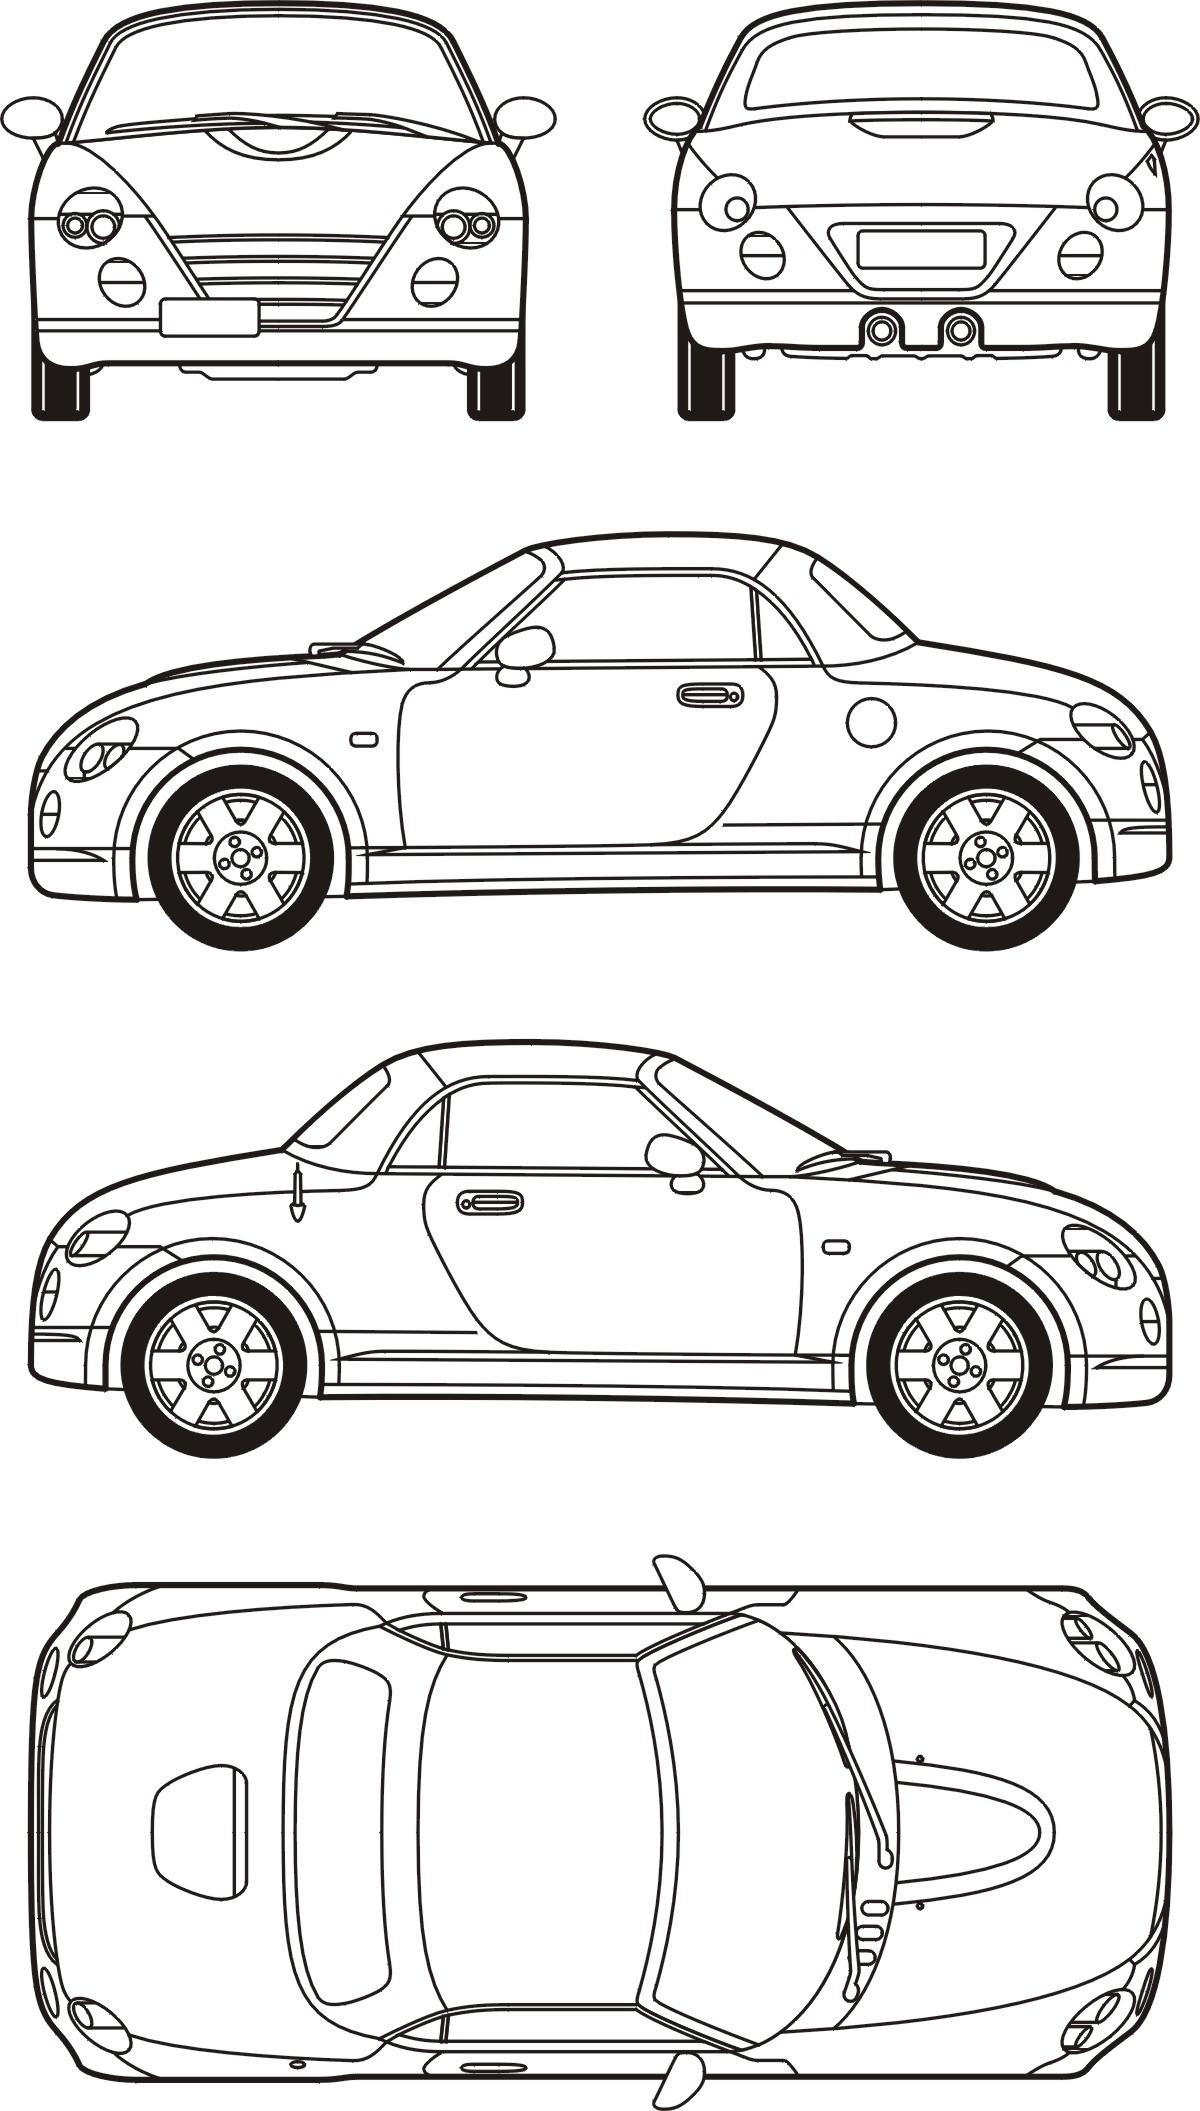 Daihatsu Copen blueprint